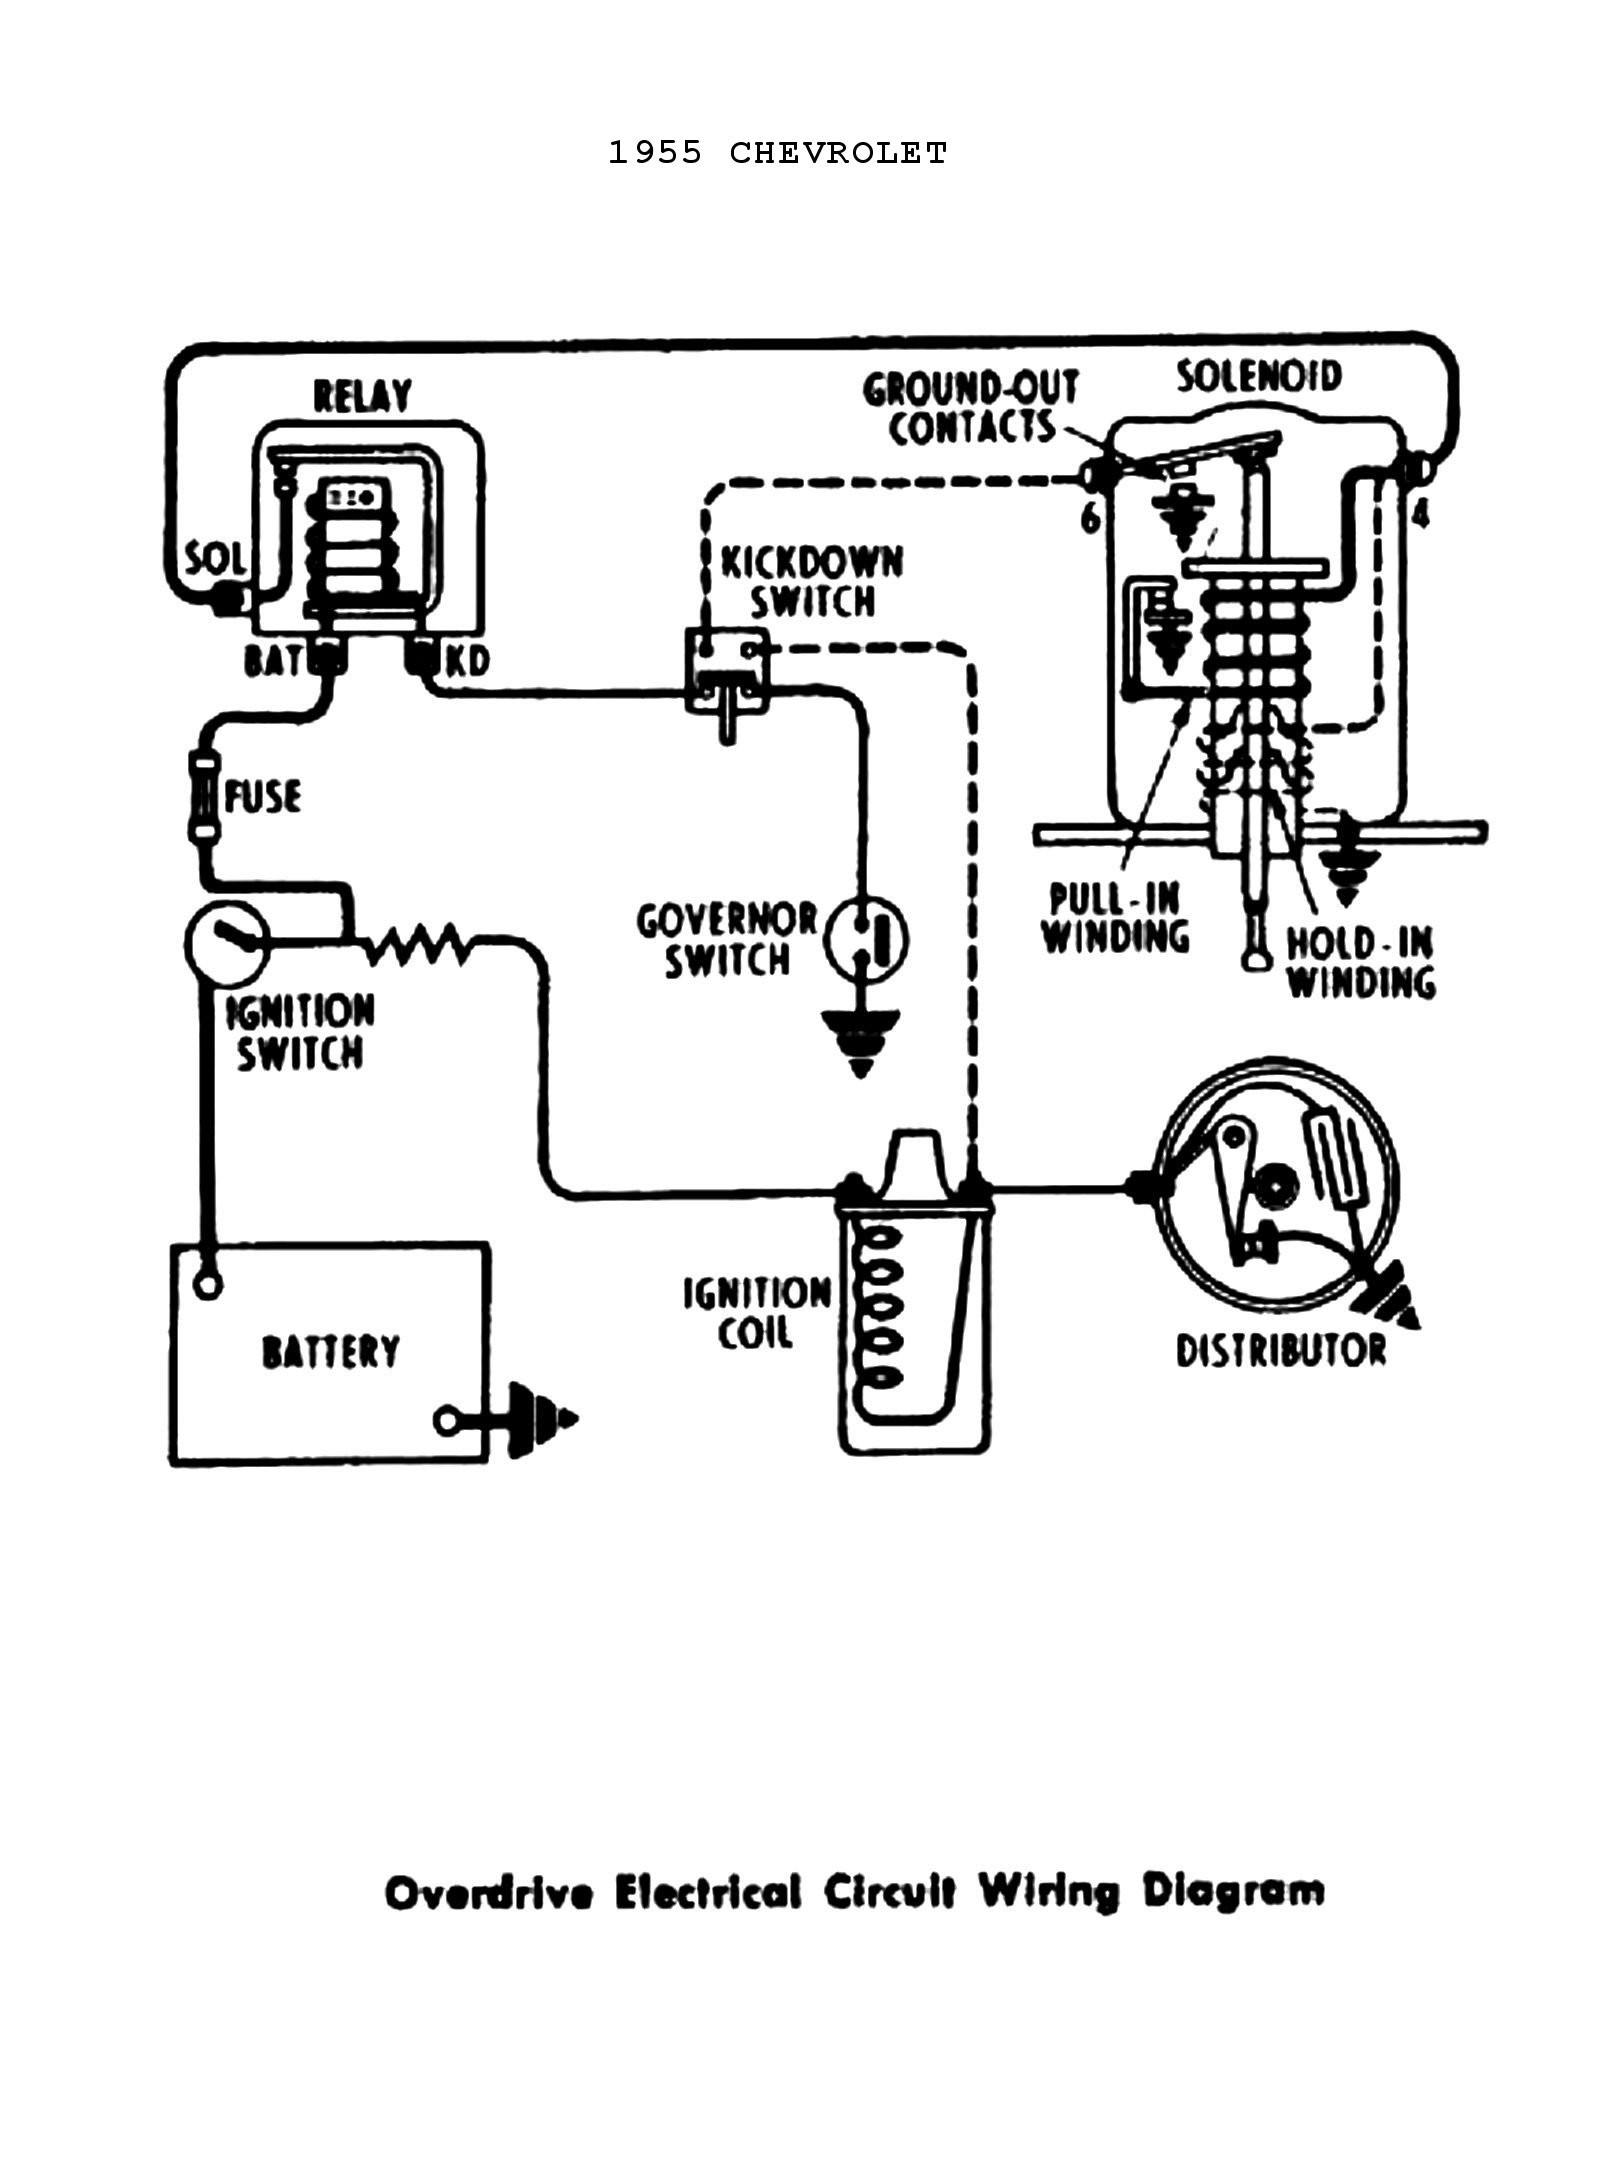 Ford Upfitter Switch Wiring Diagram 2011 4c51e Breaker Point Distributor Wiring Diagram Of Ford Upfitter Switch Wiring Diagram 2011